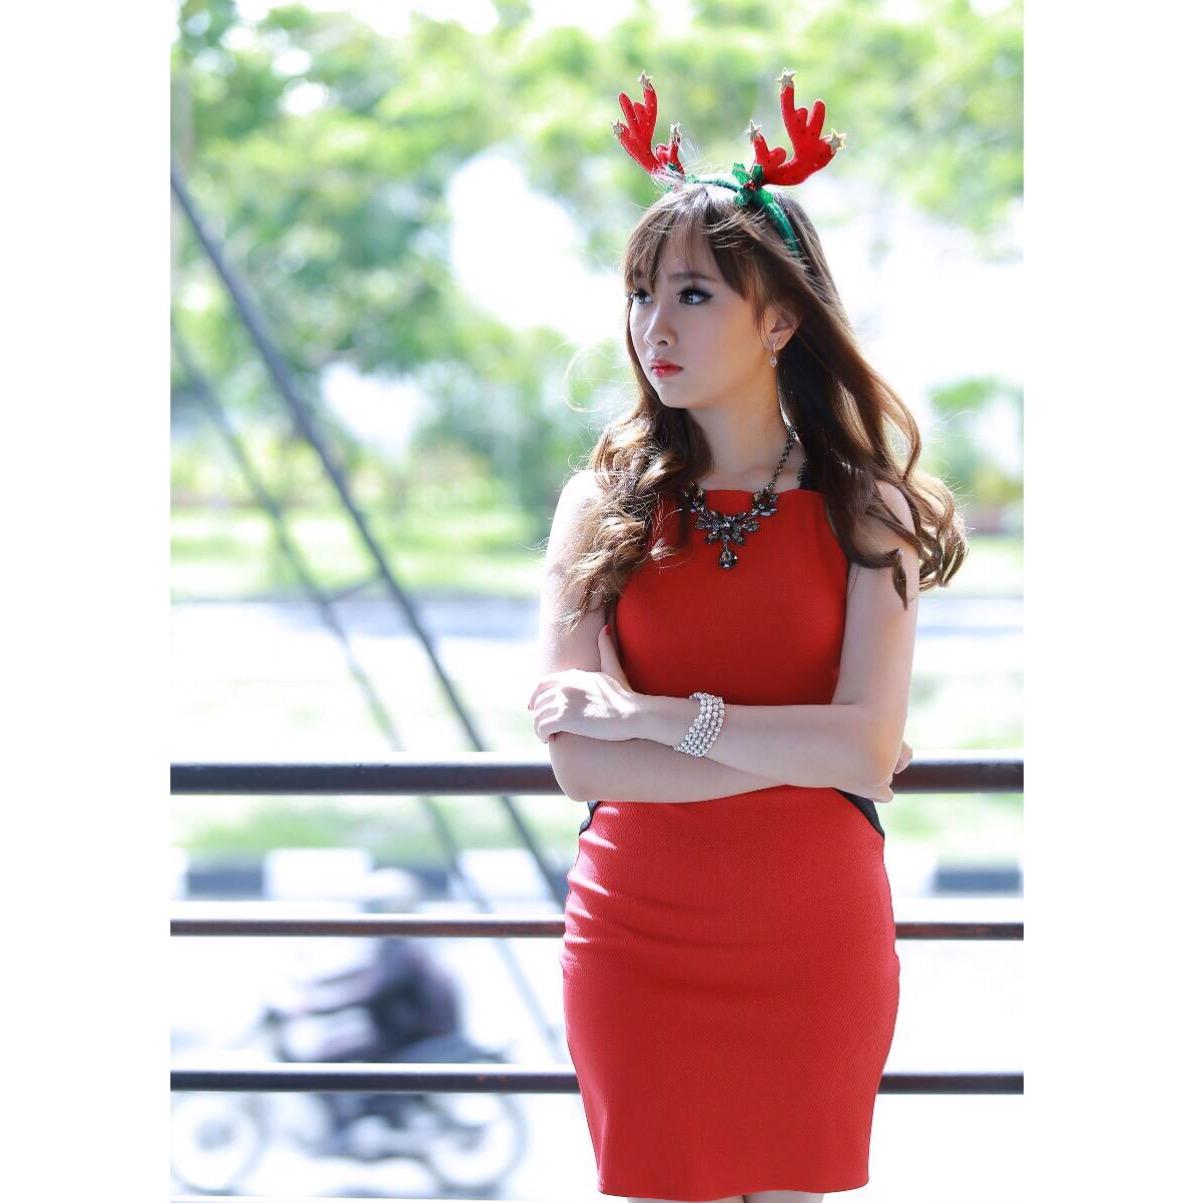 Adeline greselda profile photo